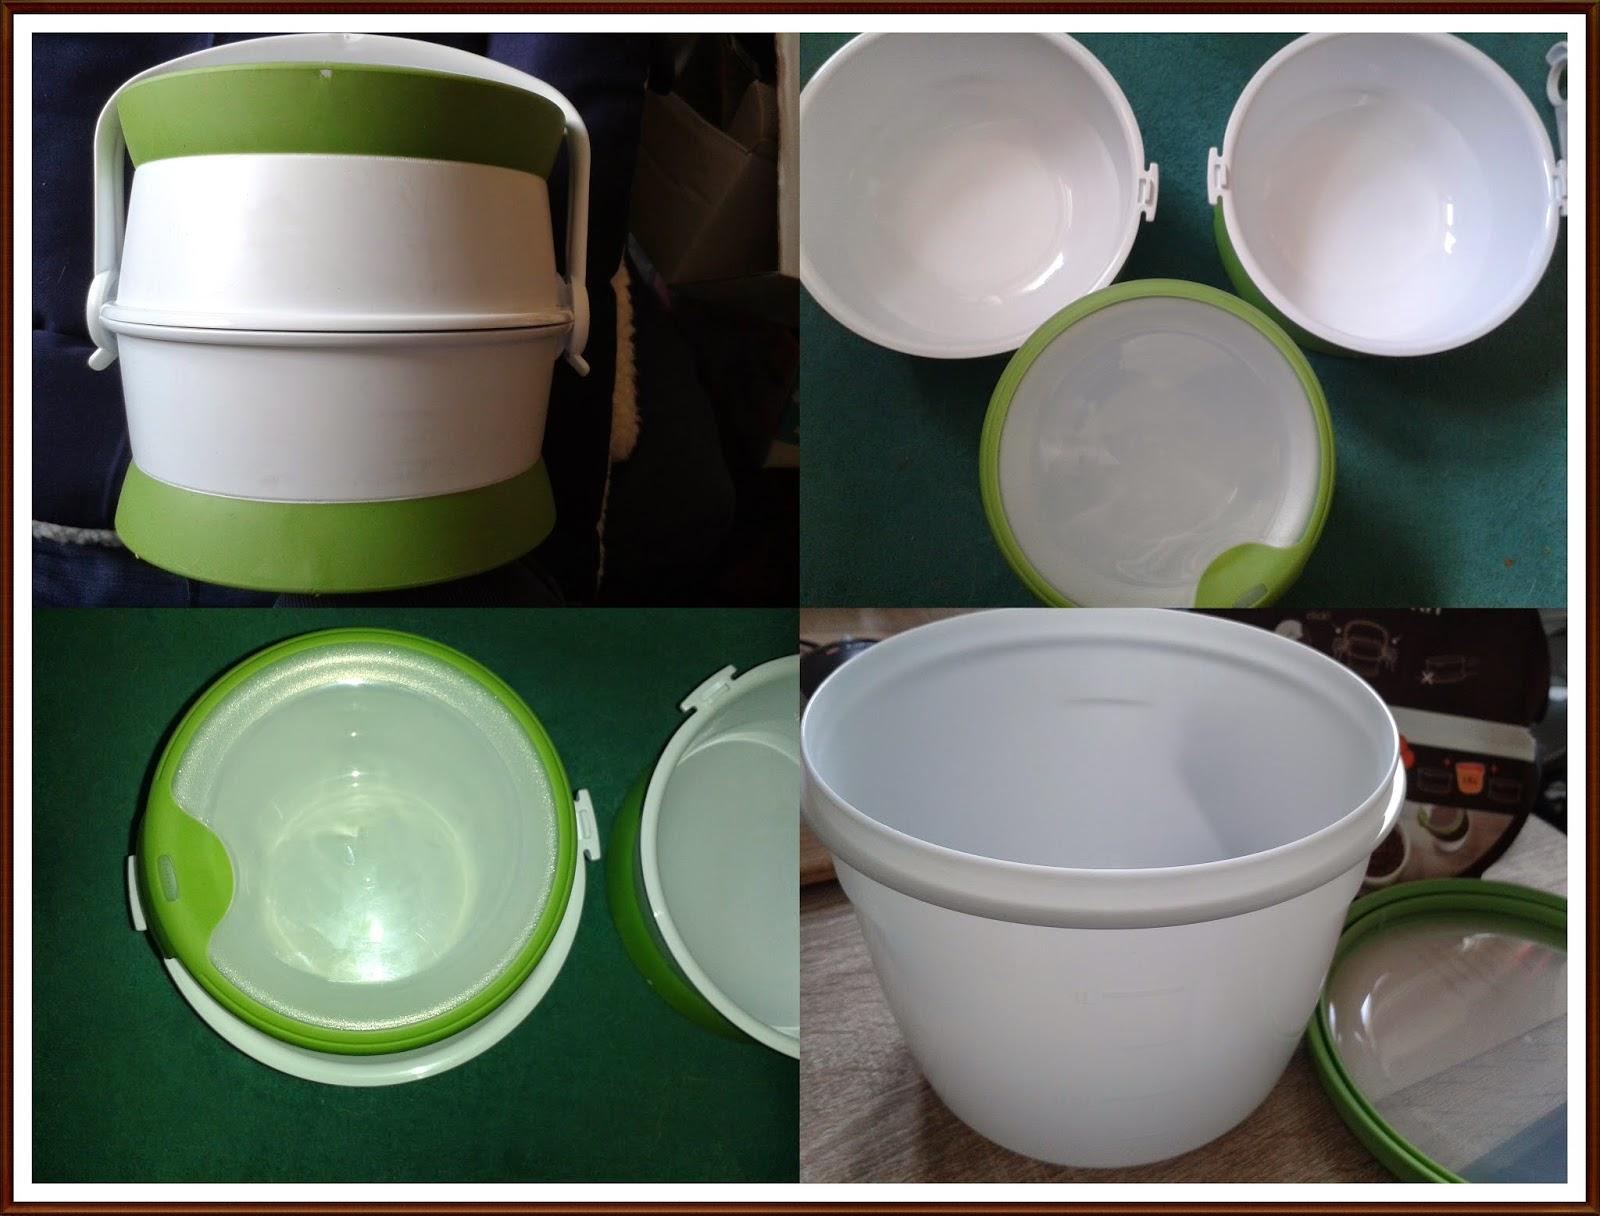 Amica Kühlschrank Nach Transport : Kühlschrank modelle